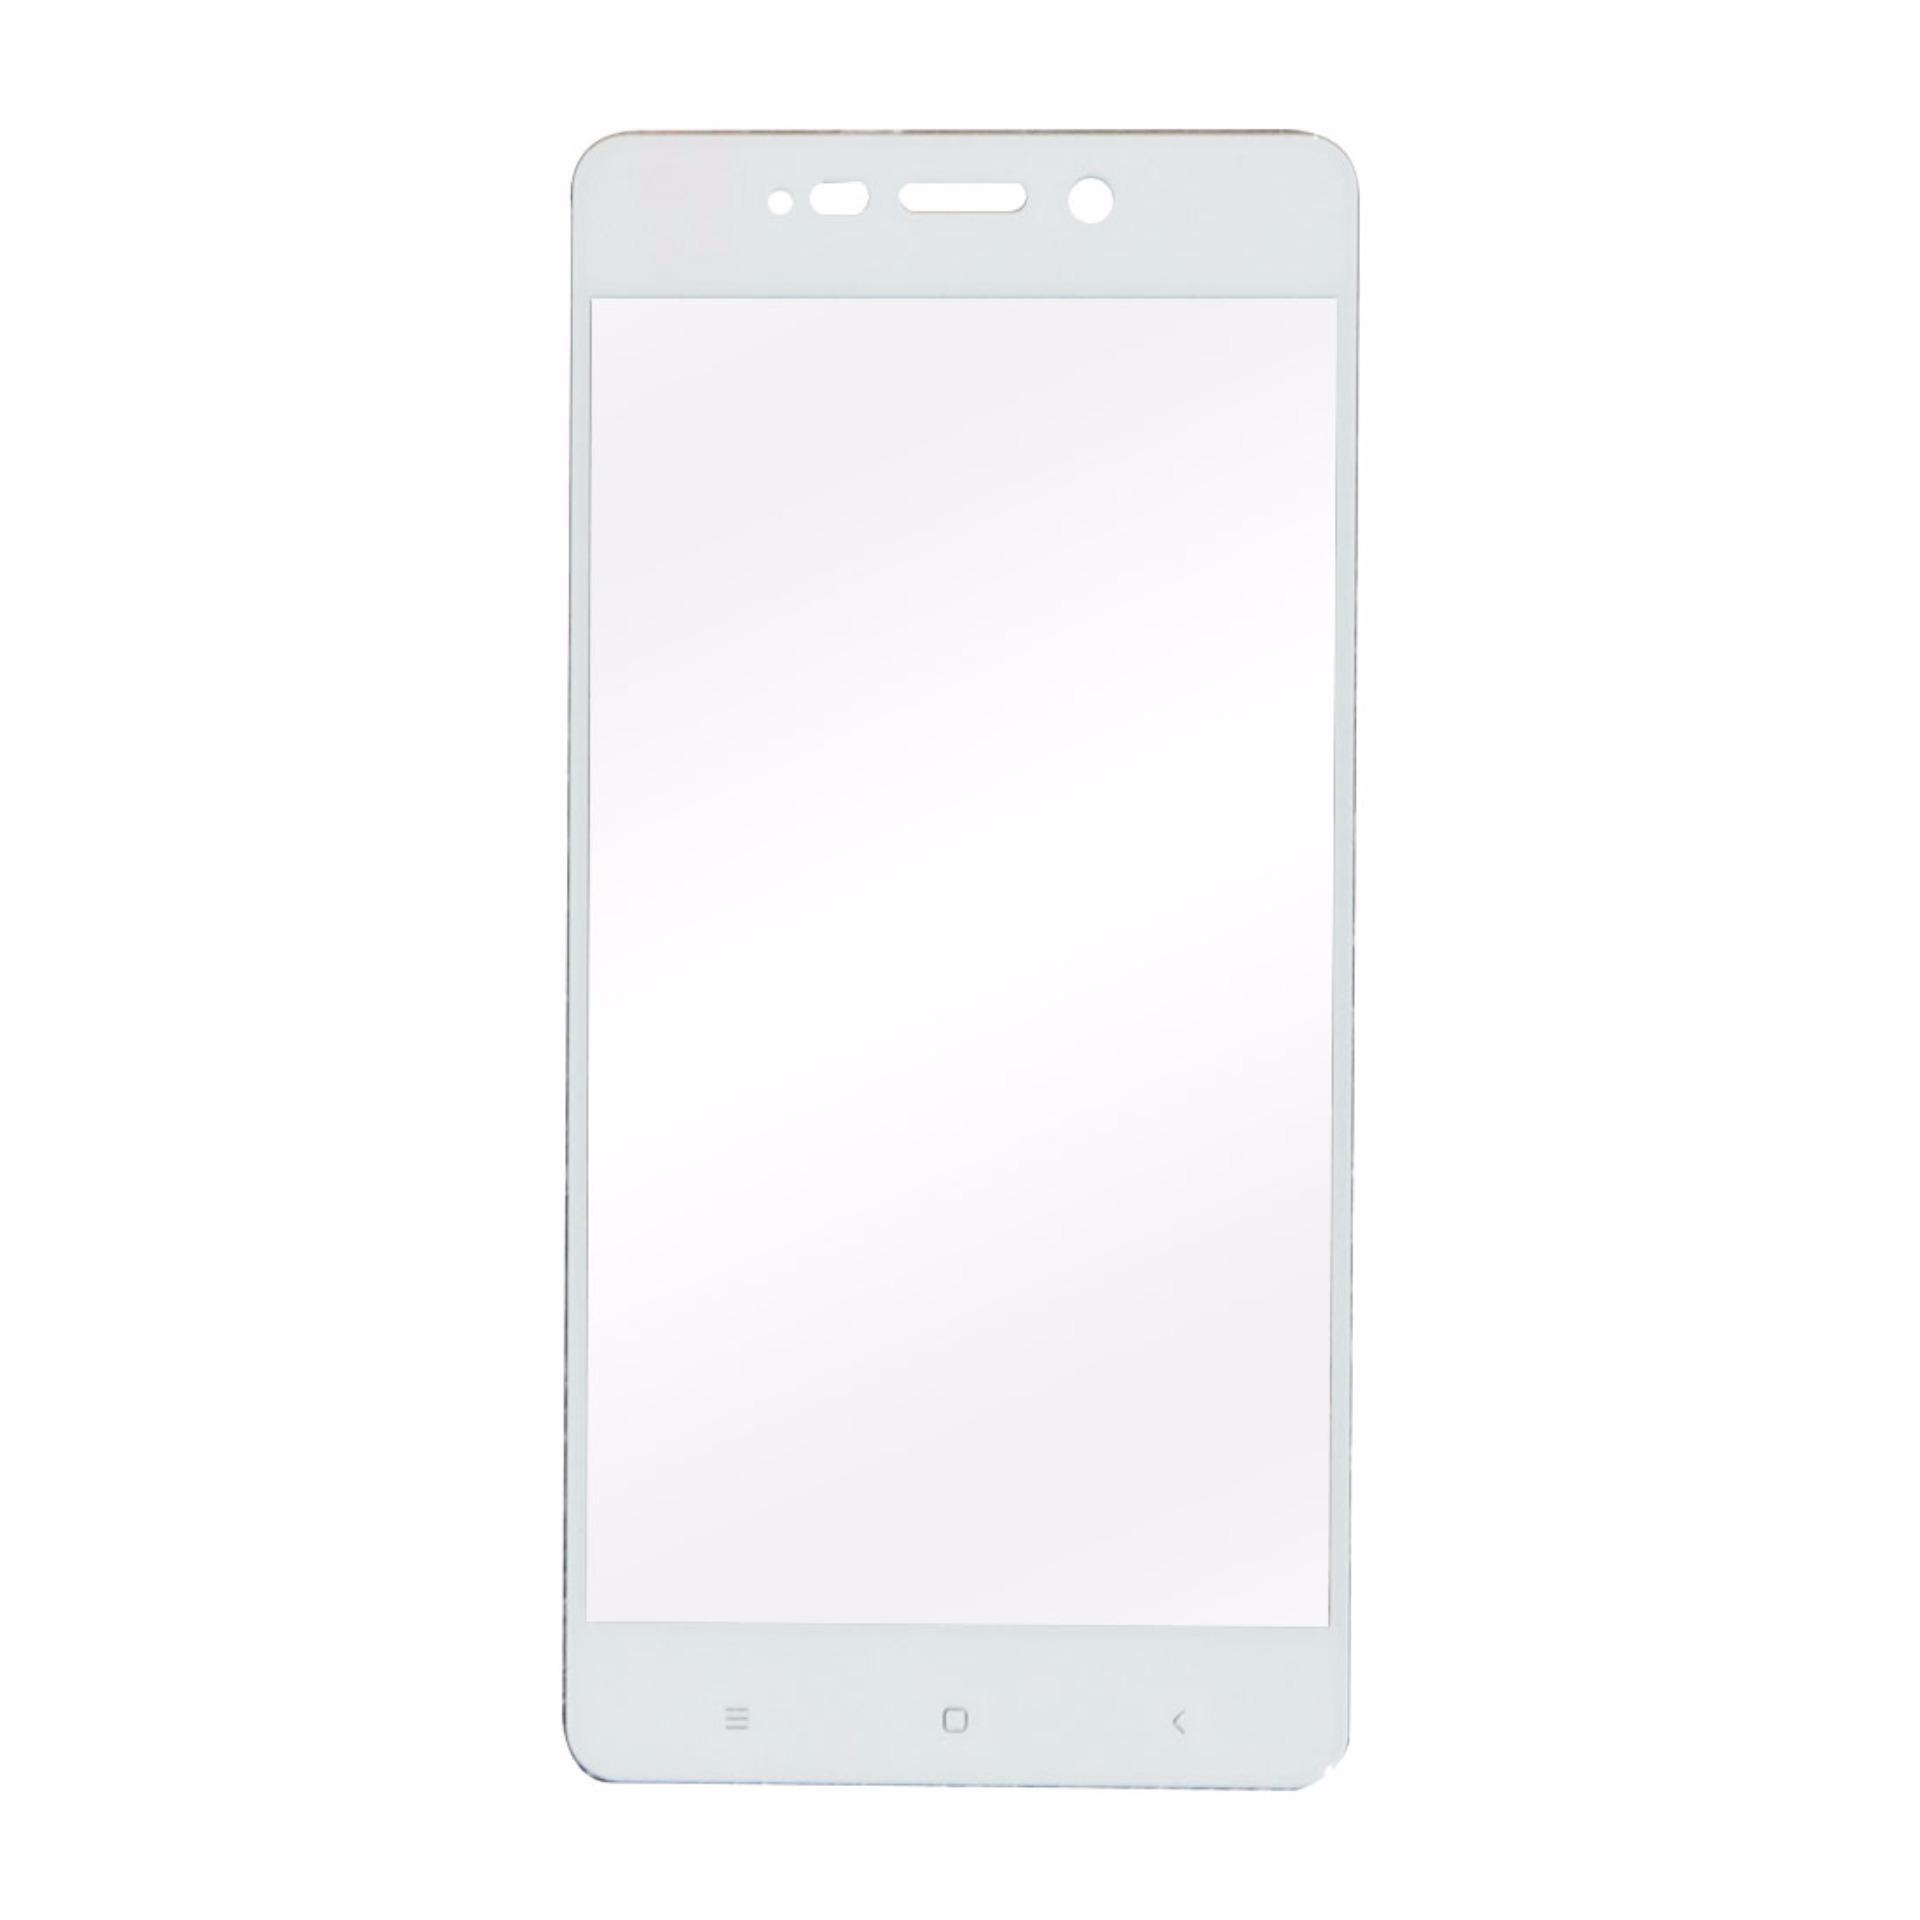 Tempered Glass Xiaomi Redmi 4 Temper Glas FullScreen Full Screen Protector Pelindung Kaca Layar HP Guard